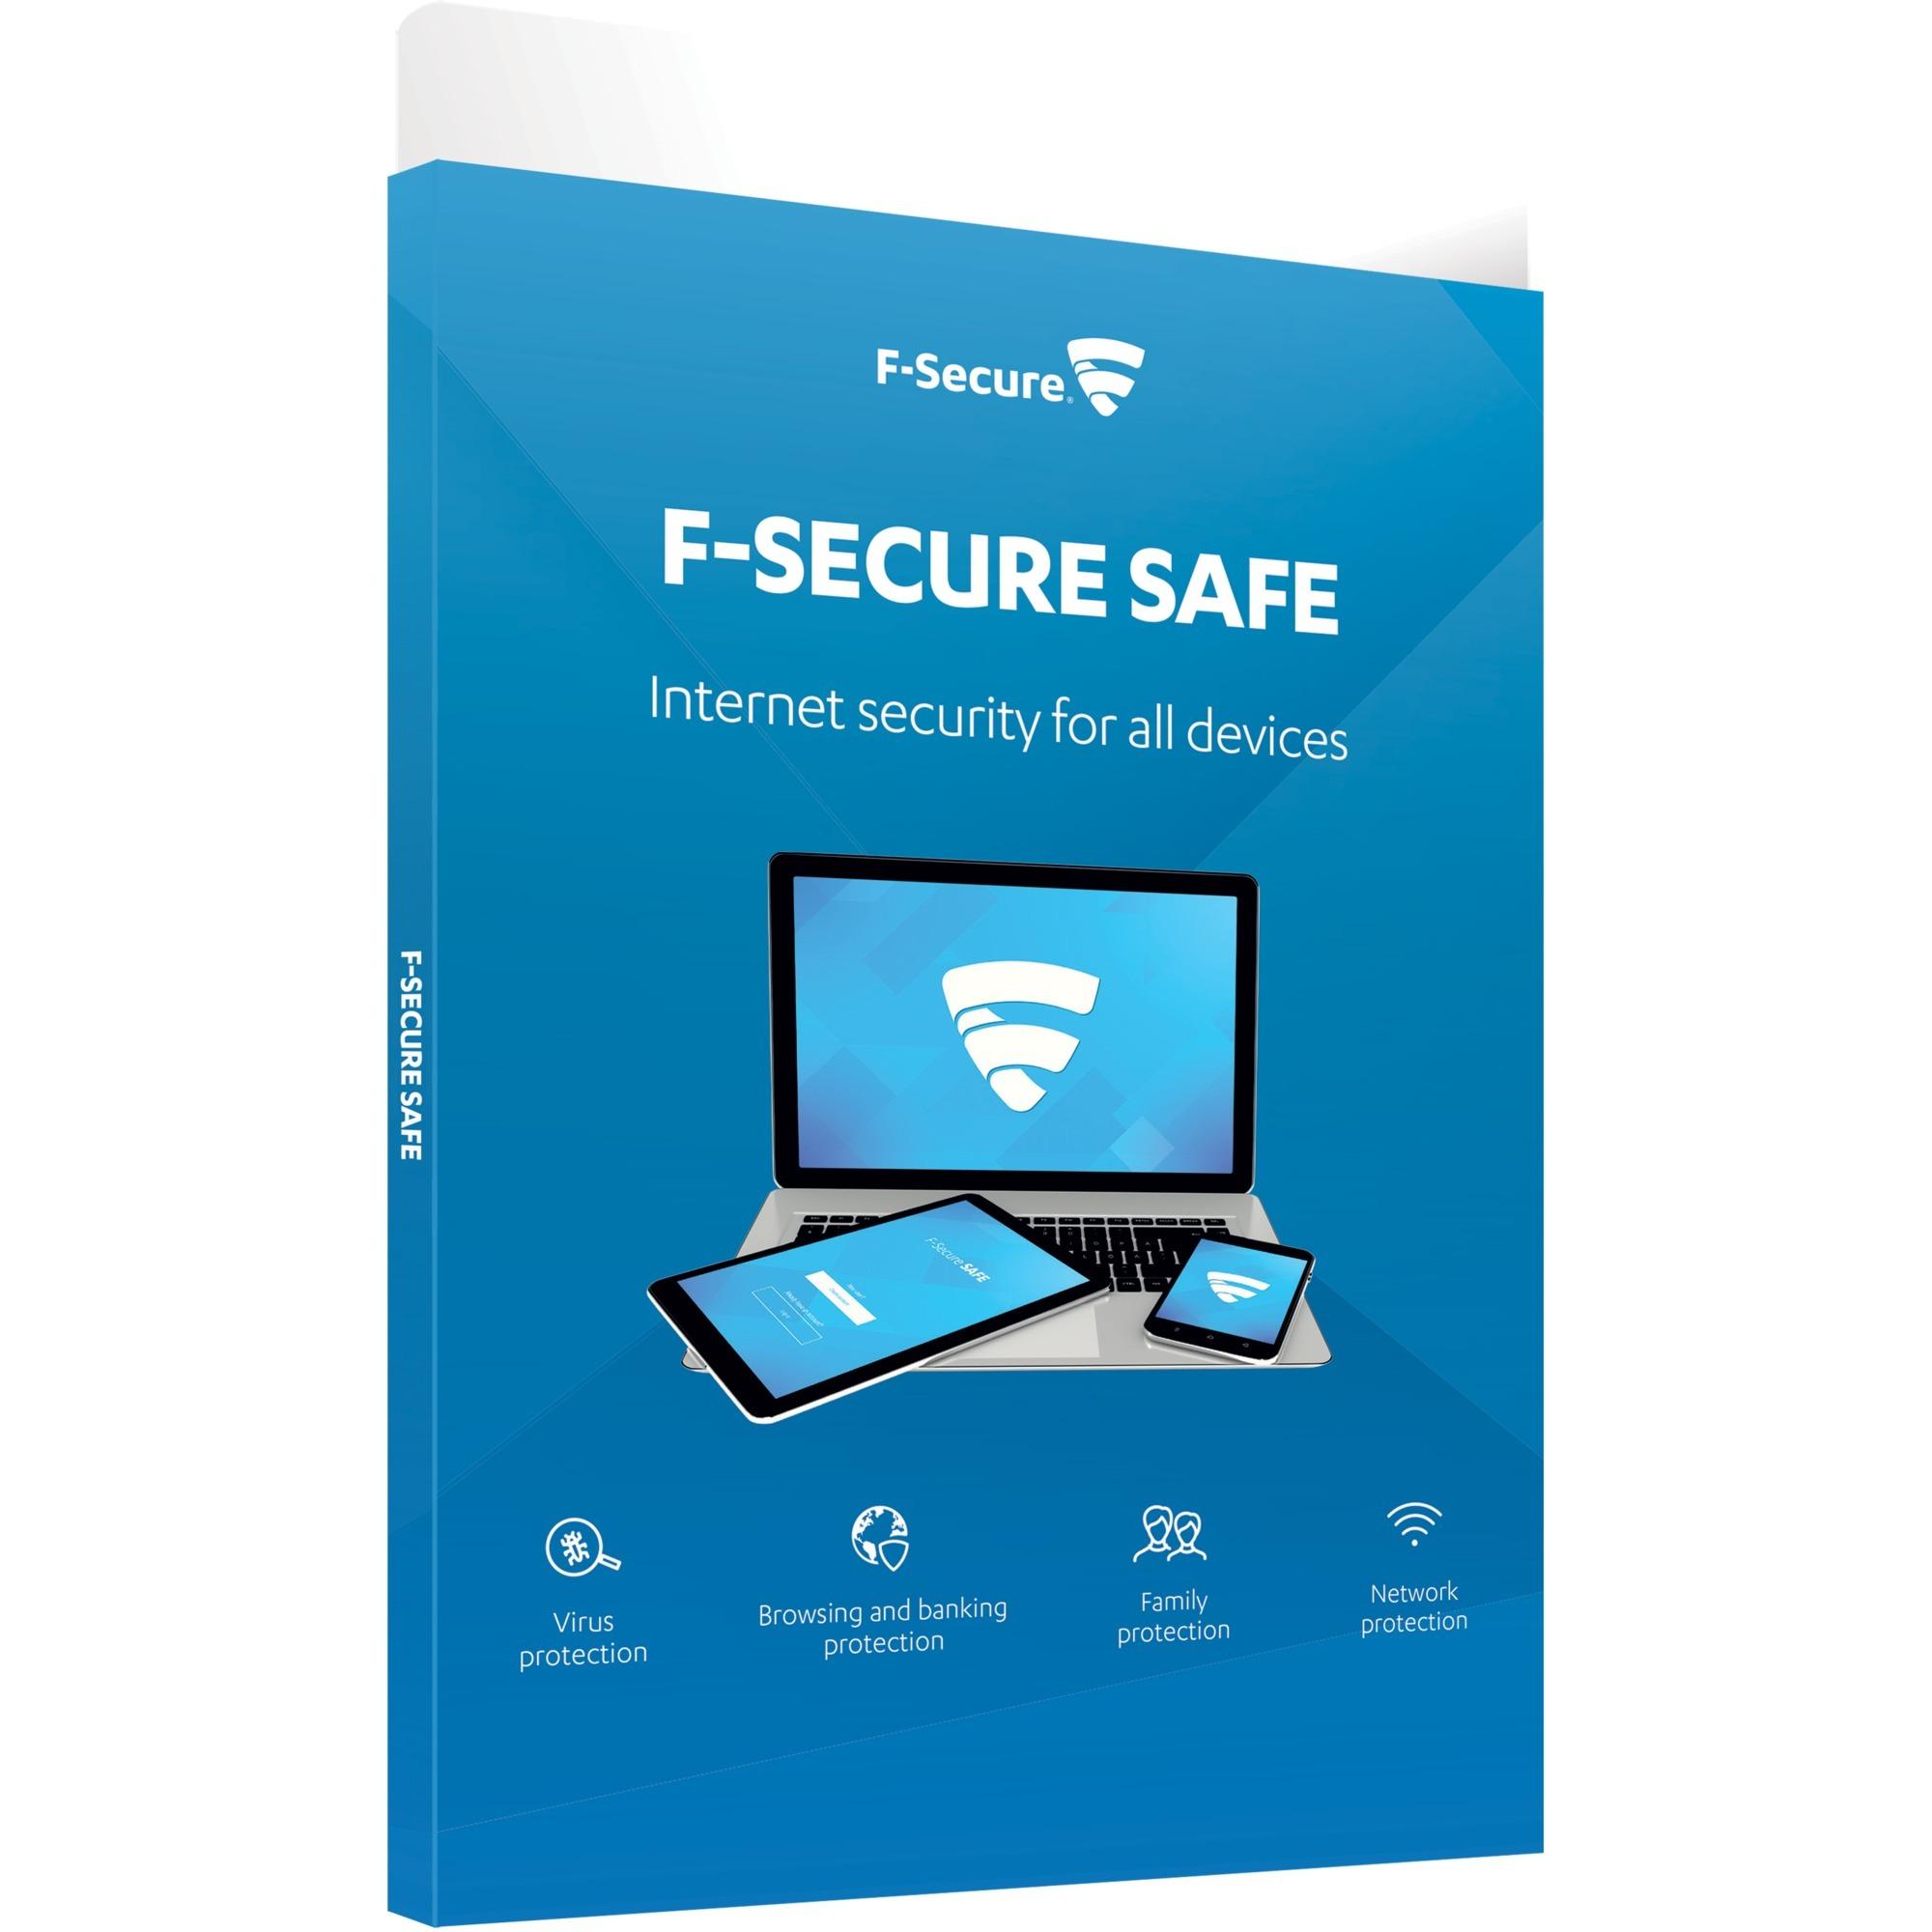 fcfxbr1n001d7-software